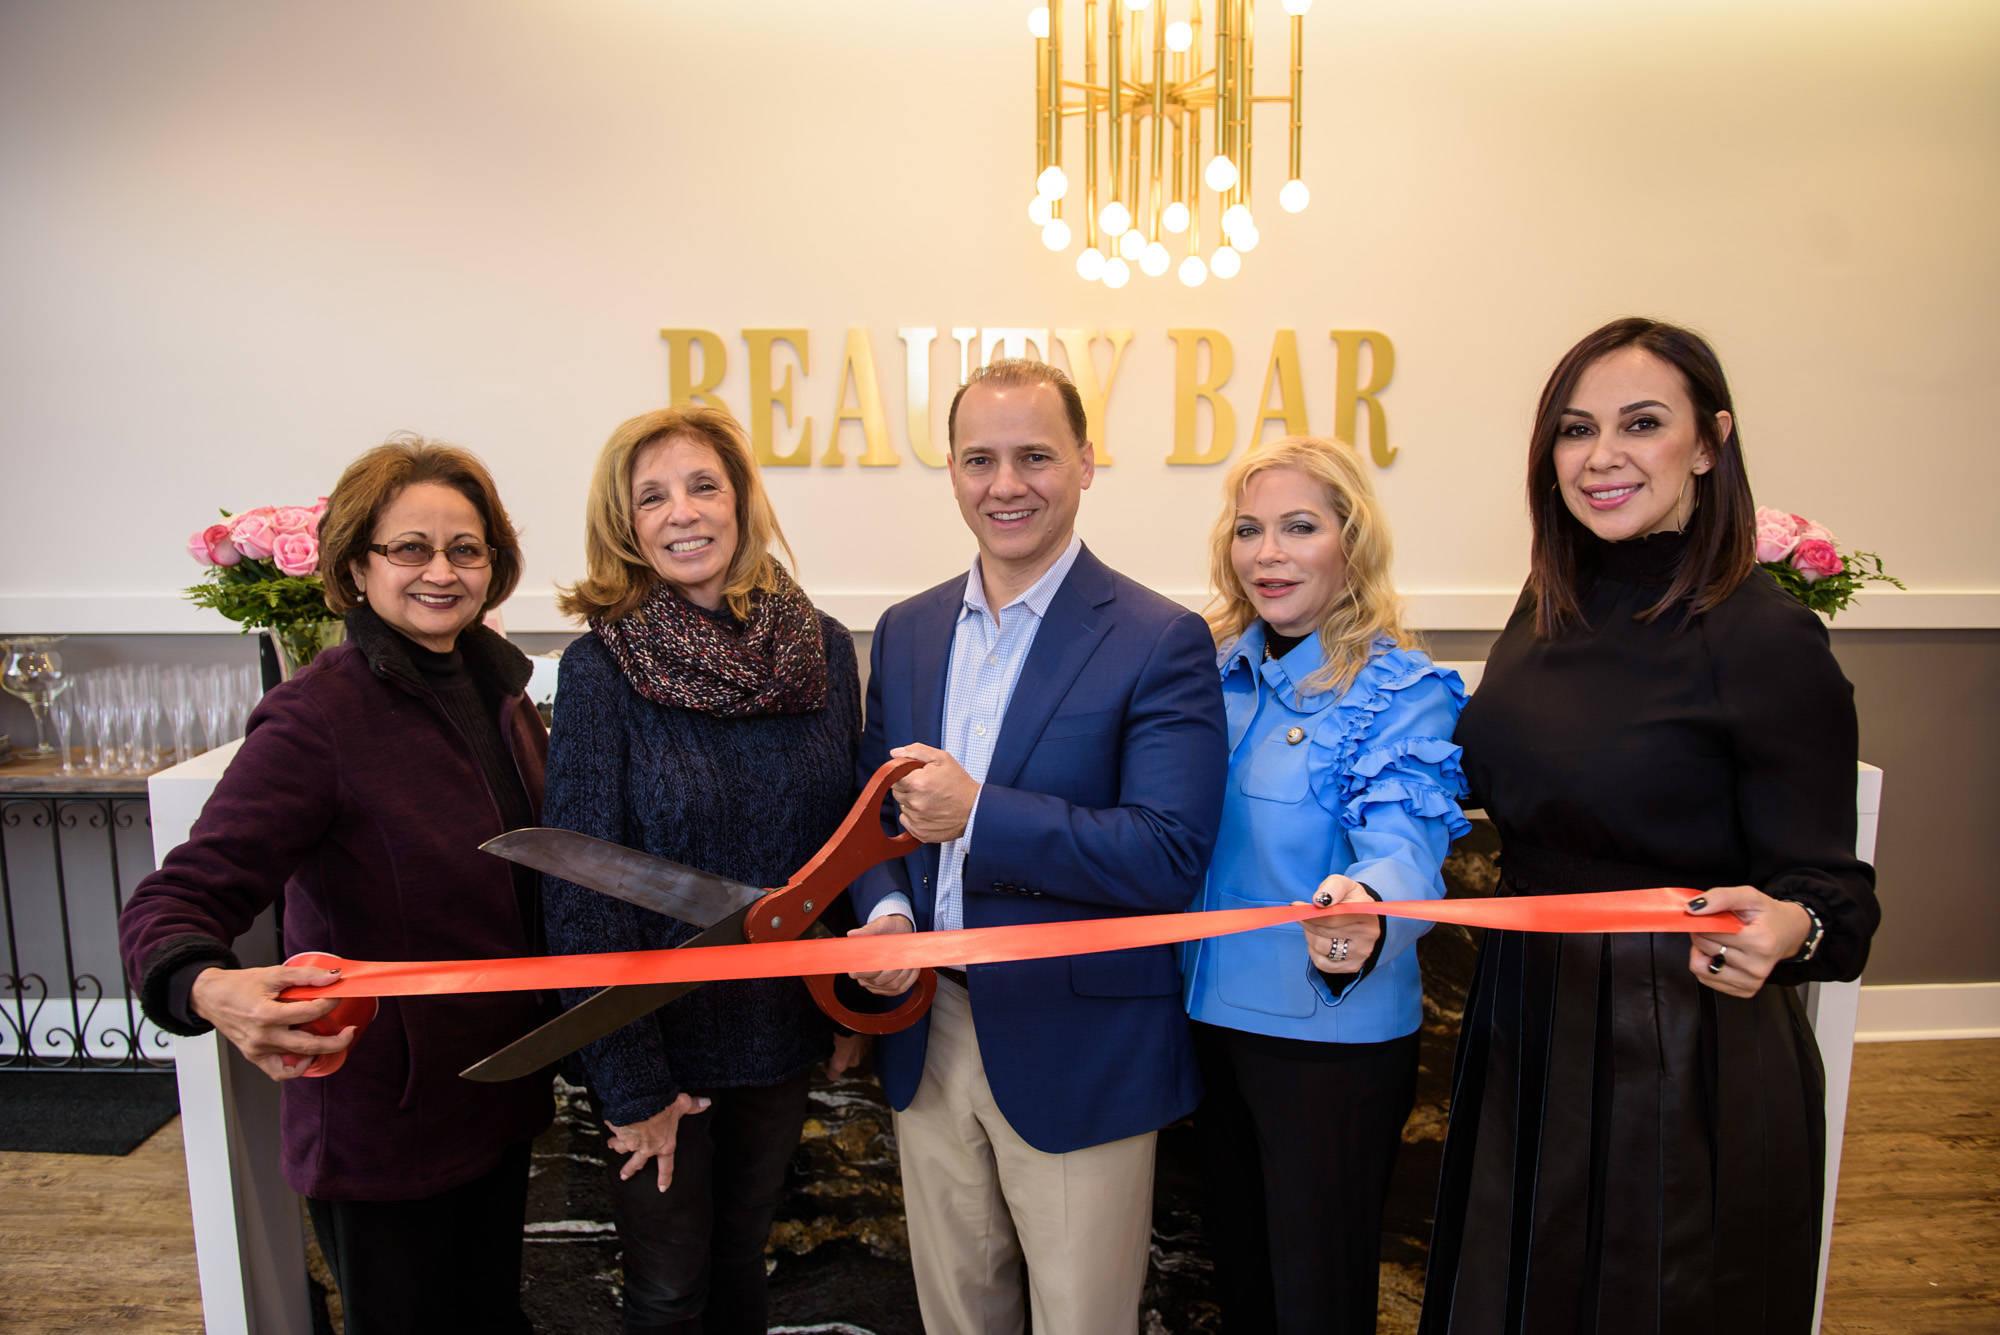 Livingston's New Dasí Salon and Beauty Bar Partner for Grand Opening Ribbon Cutting